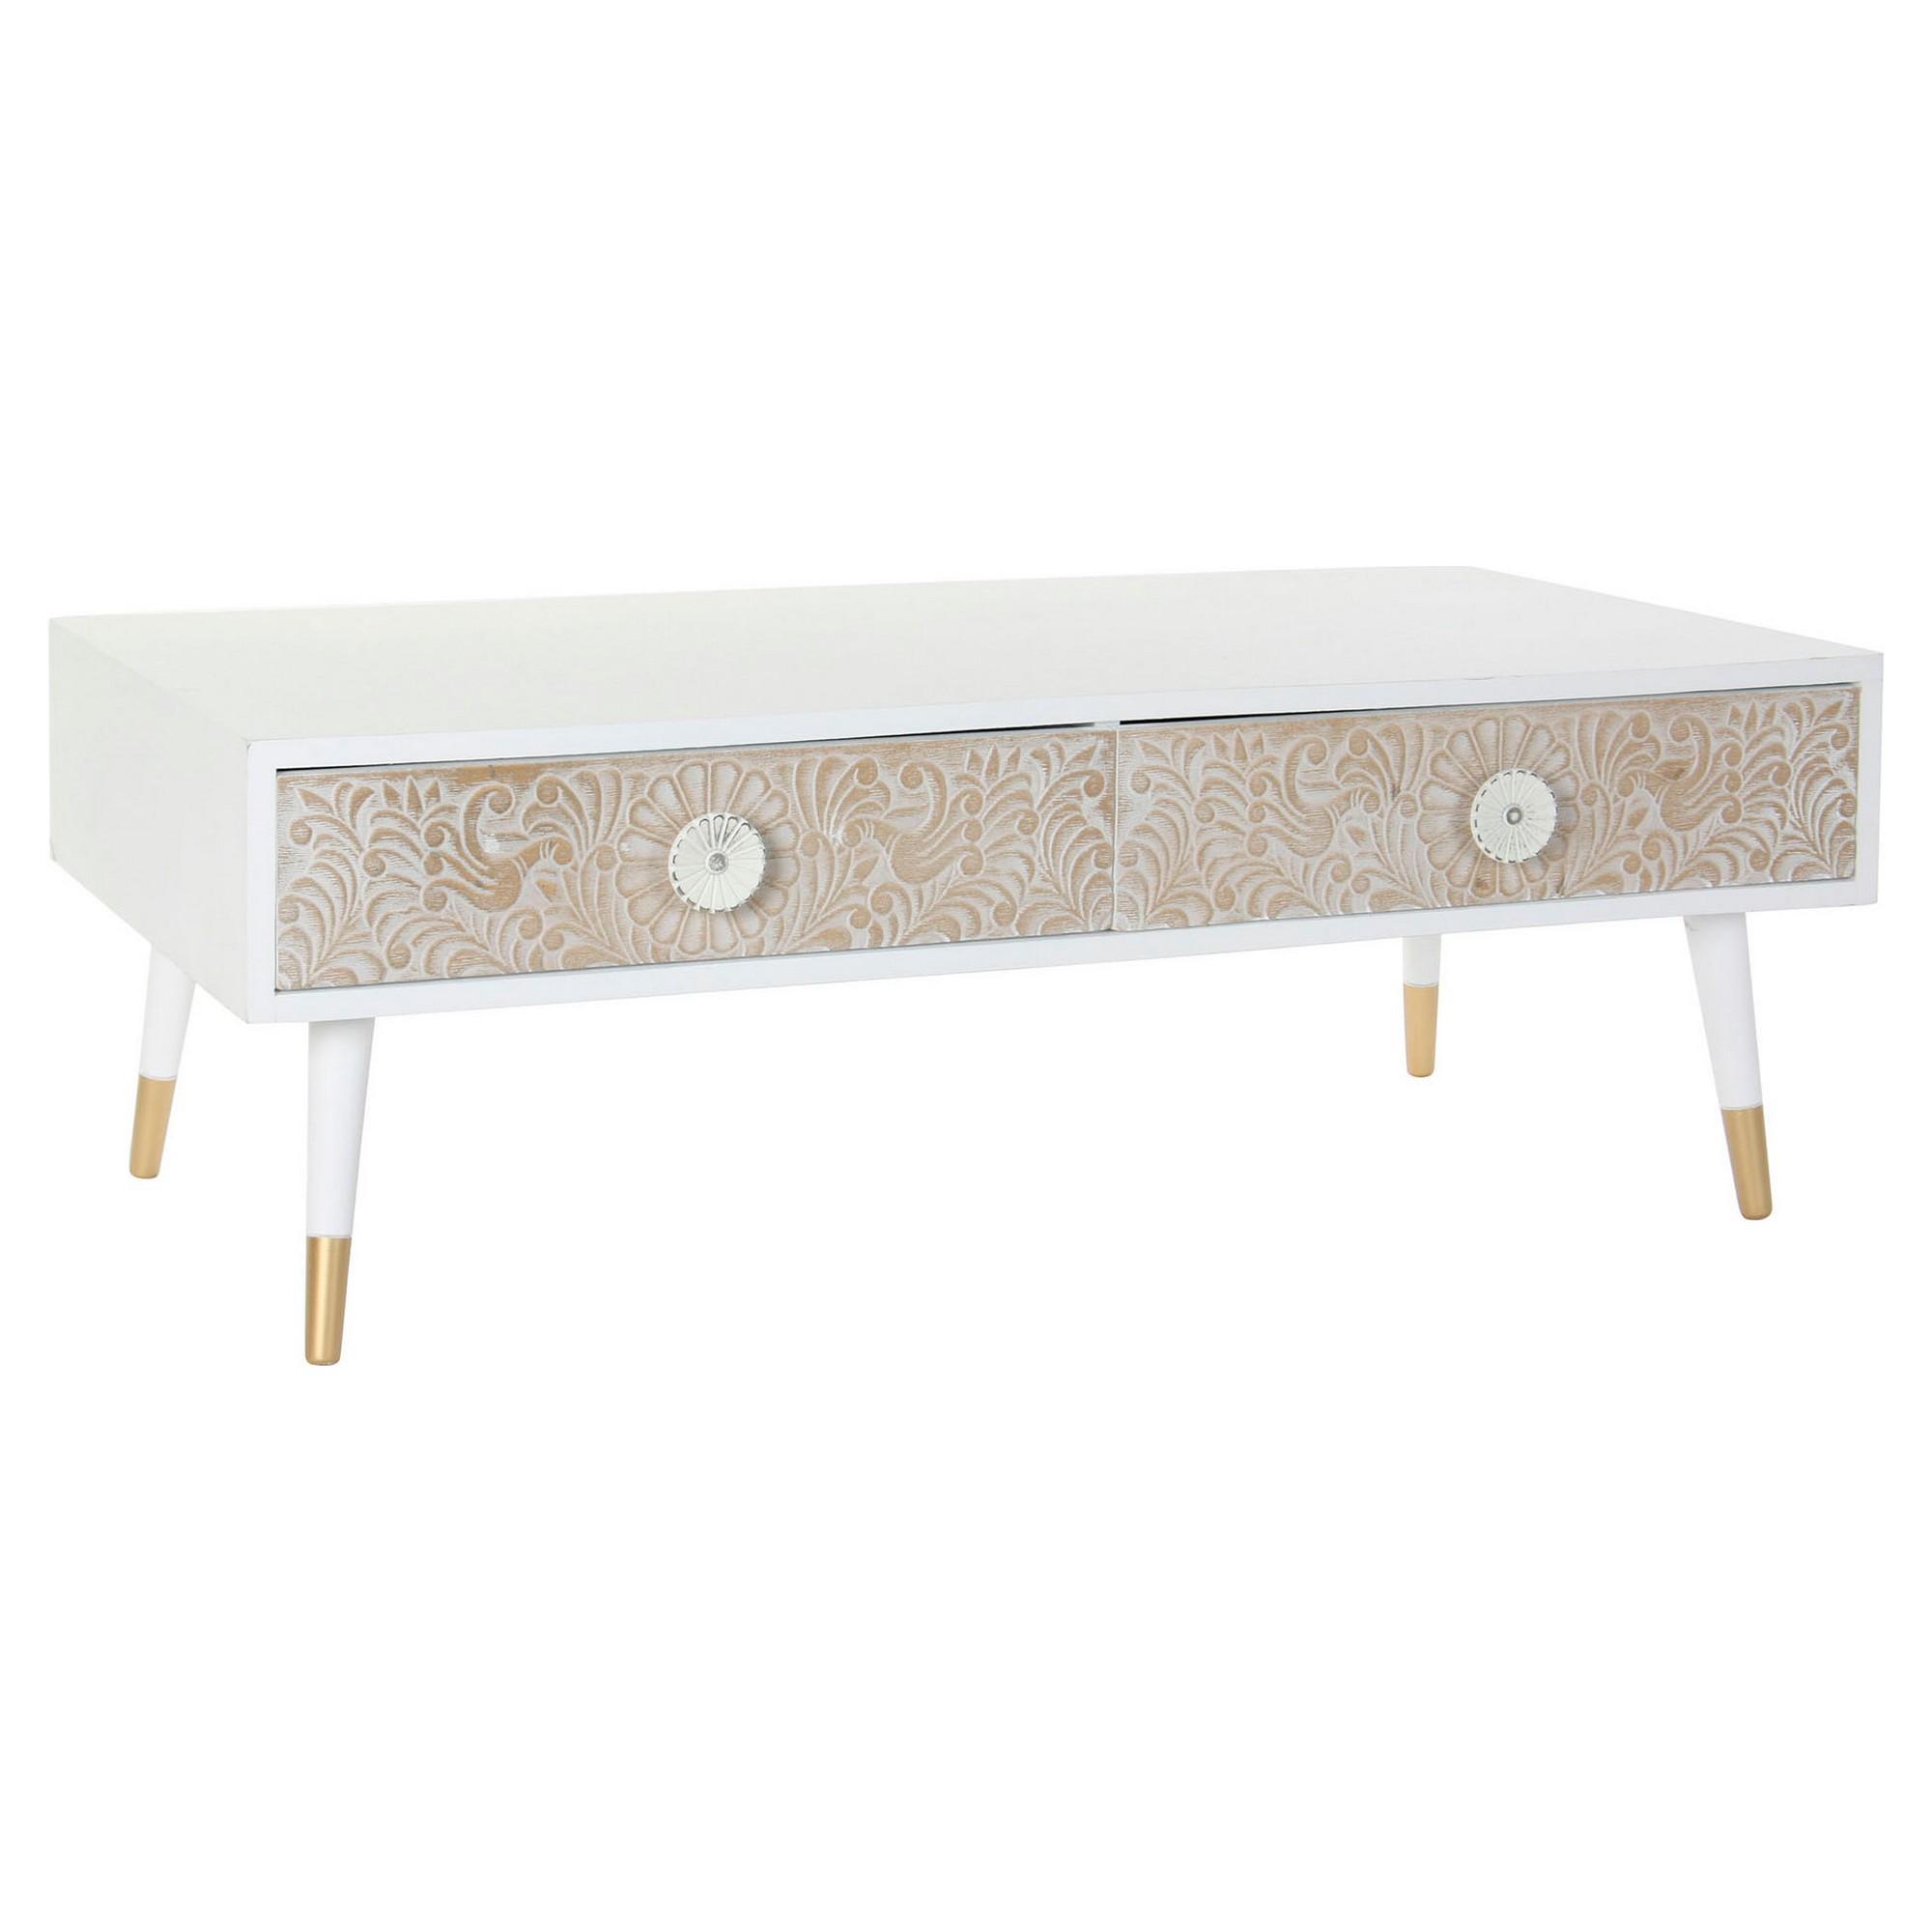 Meuble TV 2 tiroirs scandinave Louange 120cm Bois Massif Blanc et Marron Clair